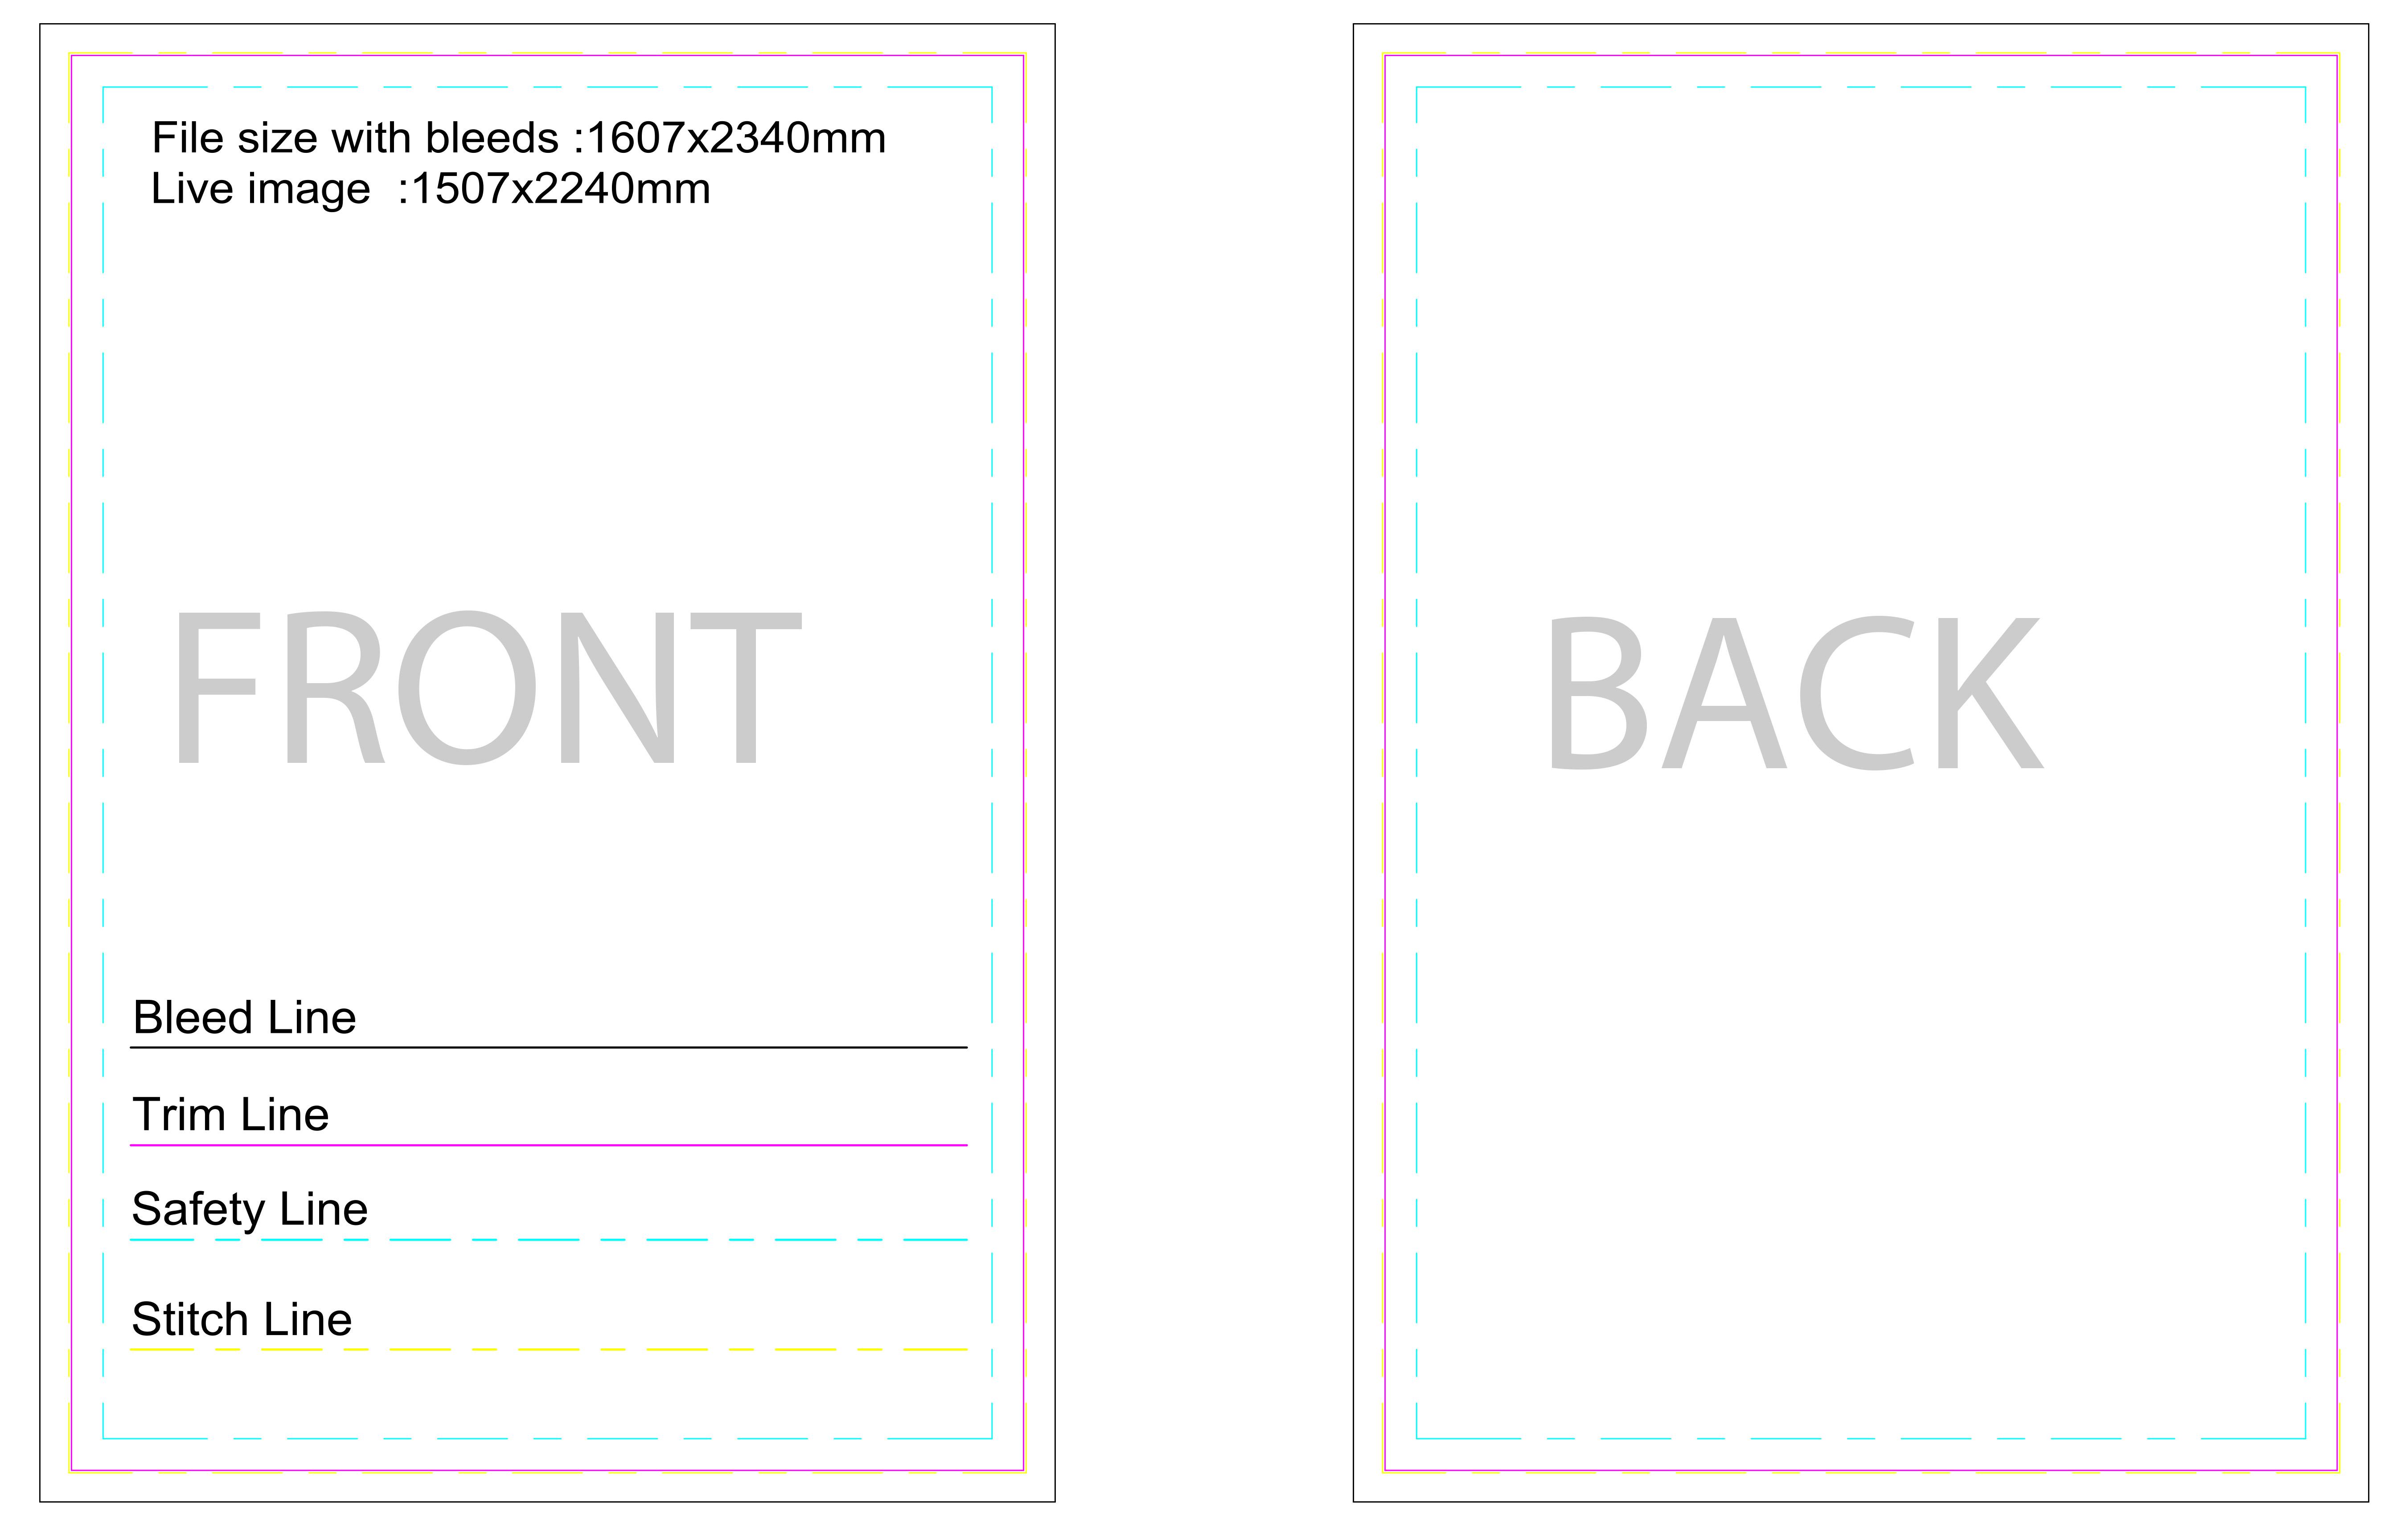 fire retardant certificate template - double sided led seg graphic light box pop up frame